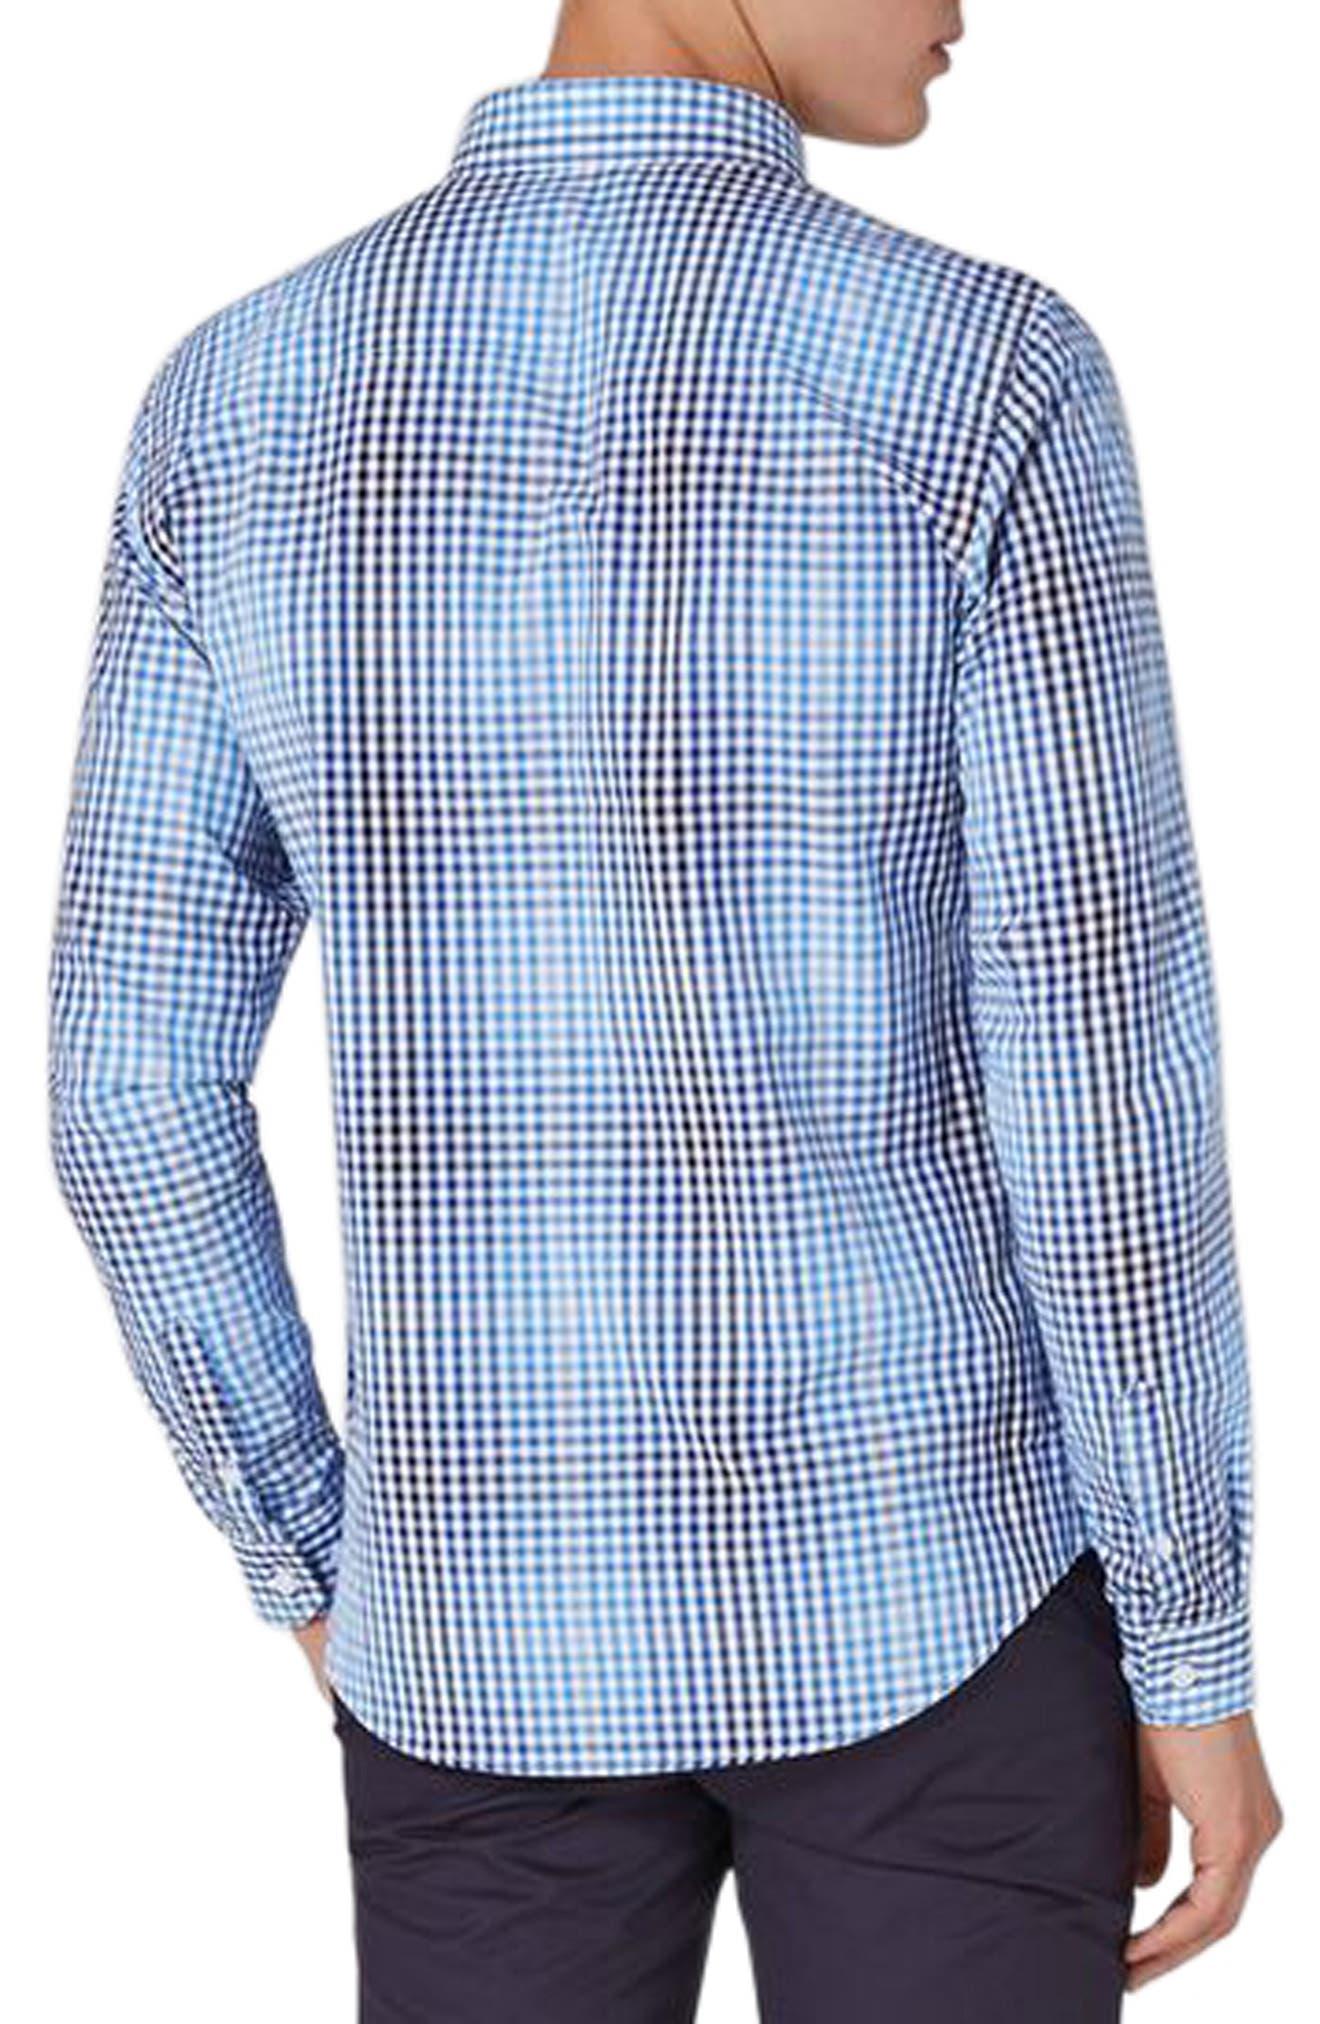 Alternate Image 2  - Topman Ombré Gingham Woven Shirt